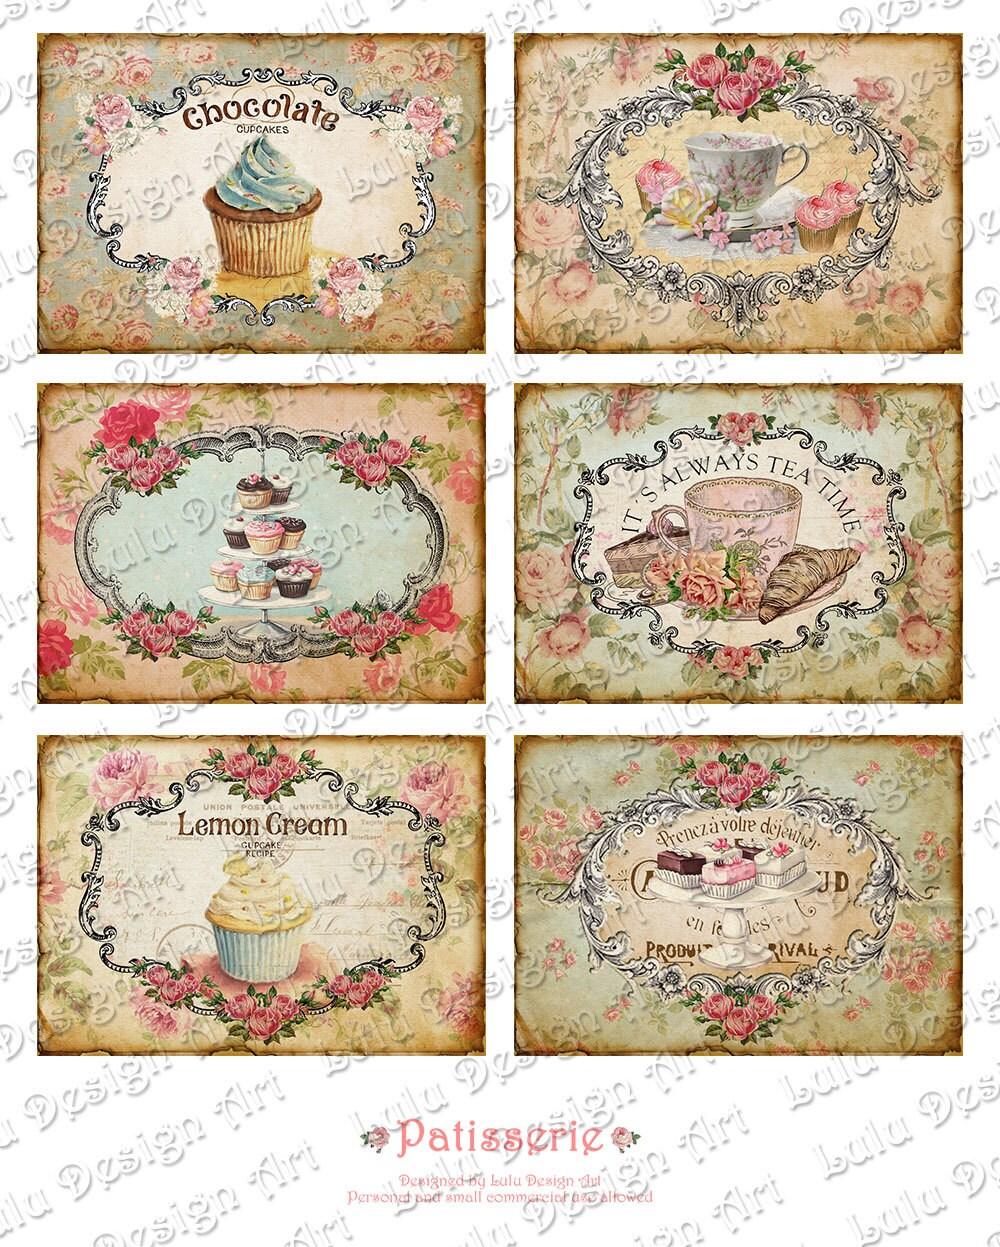 Patisserie Digital Cards Vintage Tags By Luludesignart On Etsy